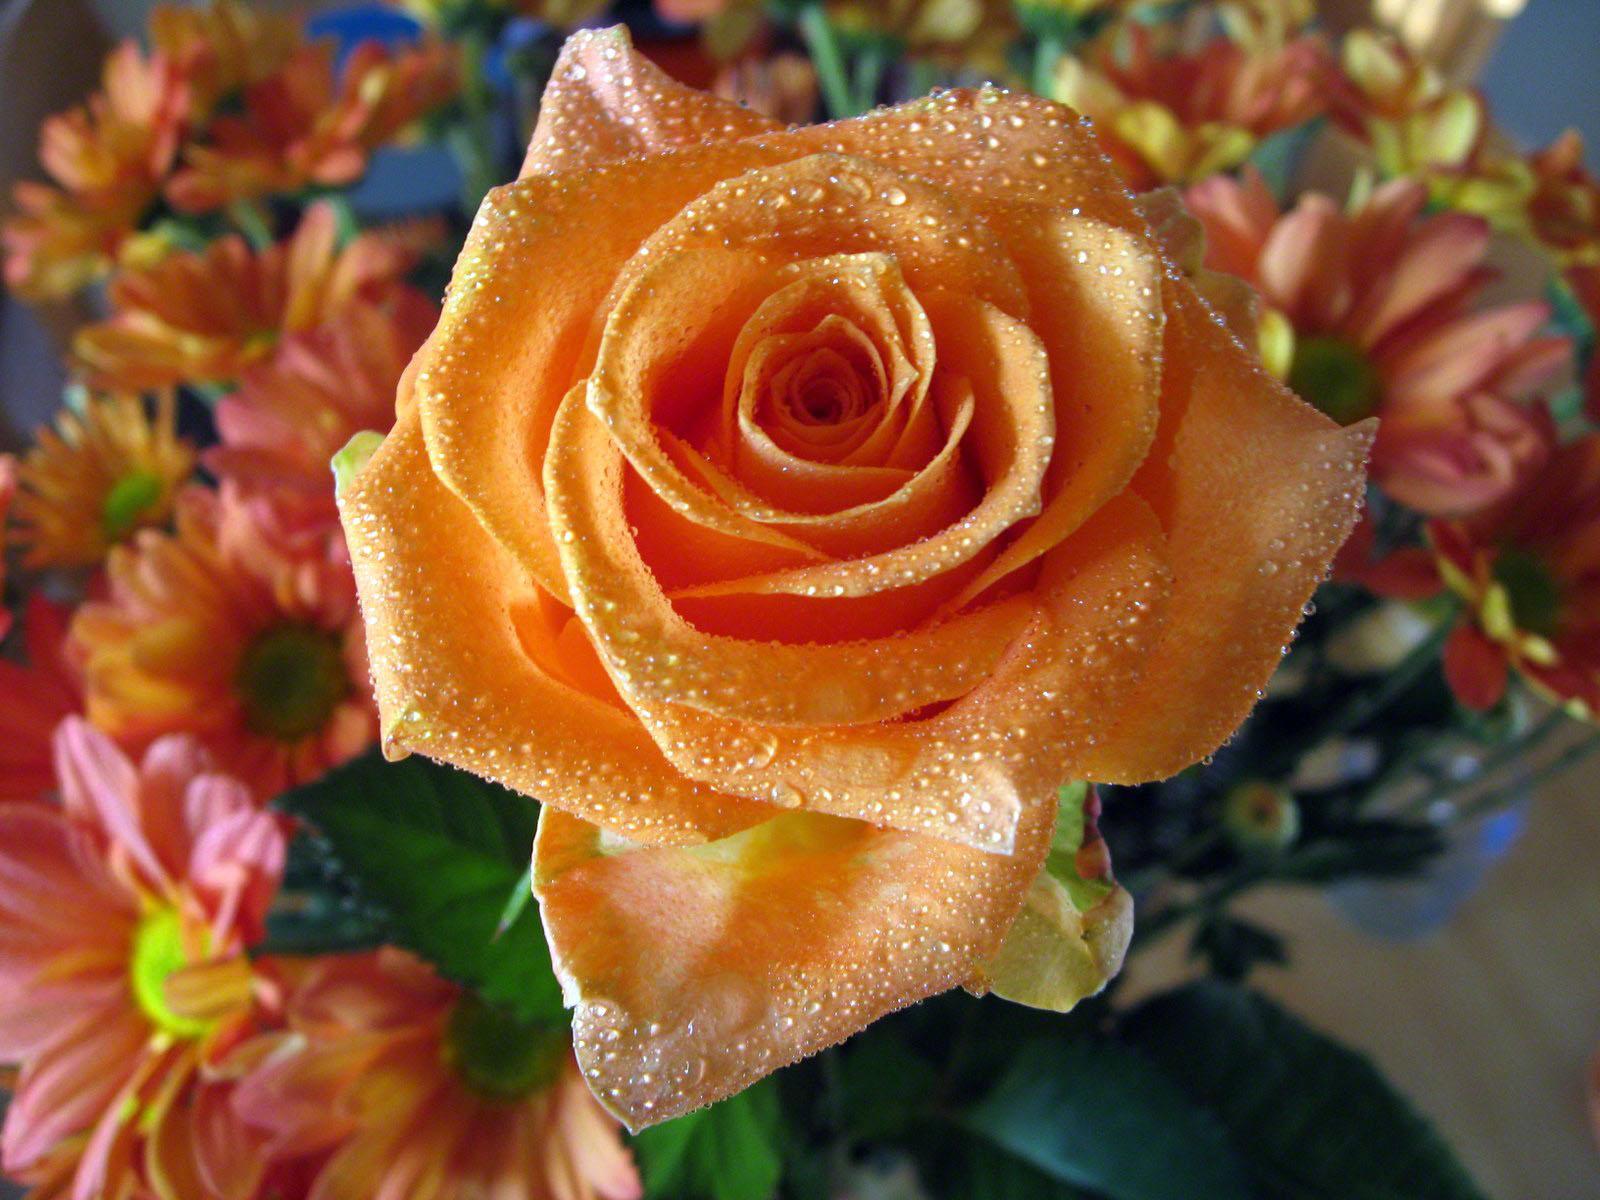 http://www.fabiovisentin.com/photography/photo/12/roses-wallpaper-roses-bouquets4426.JPG